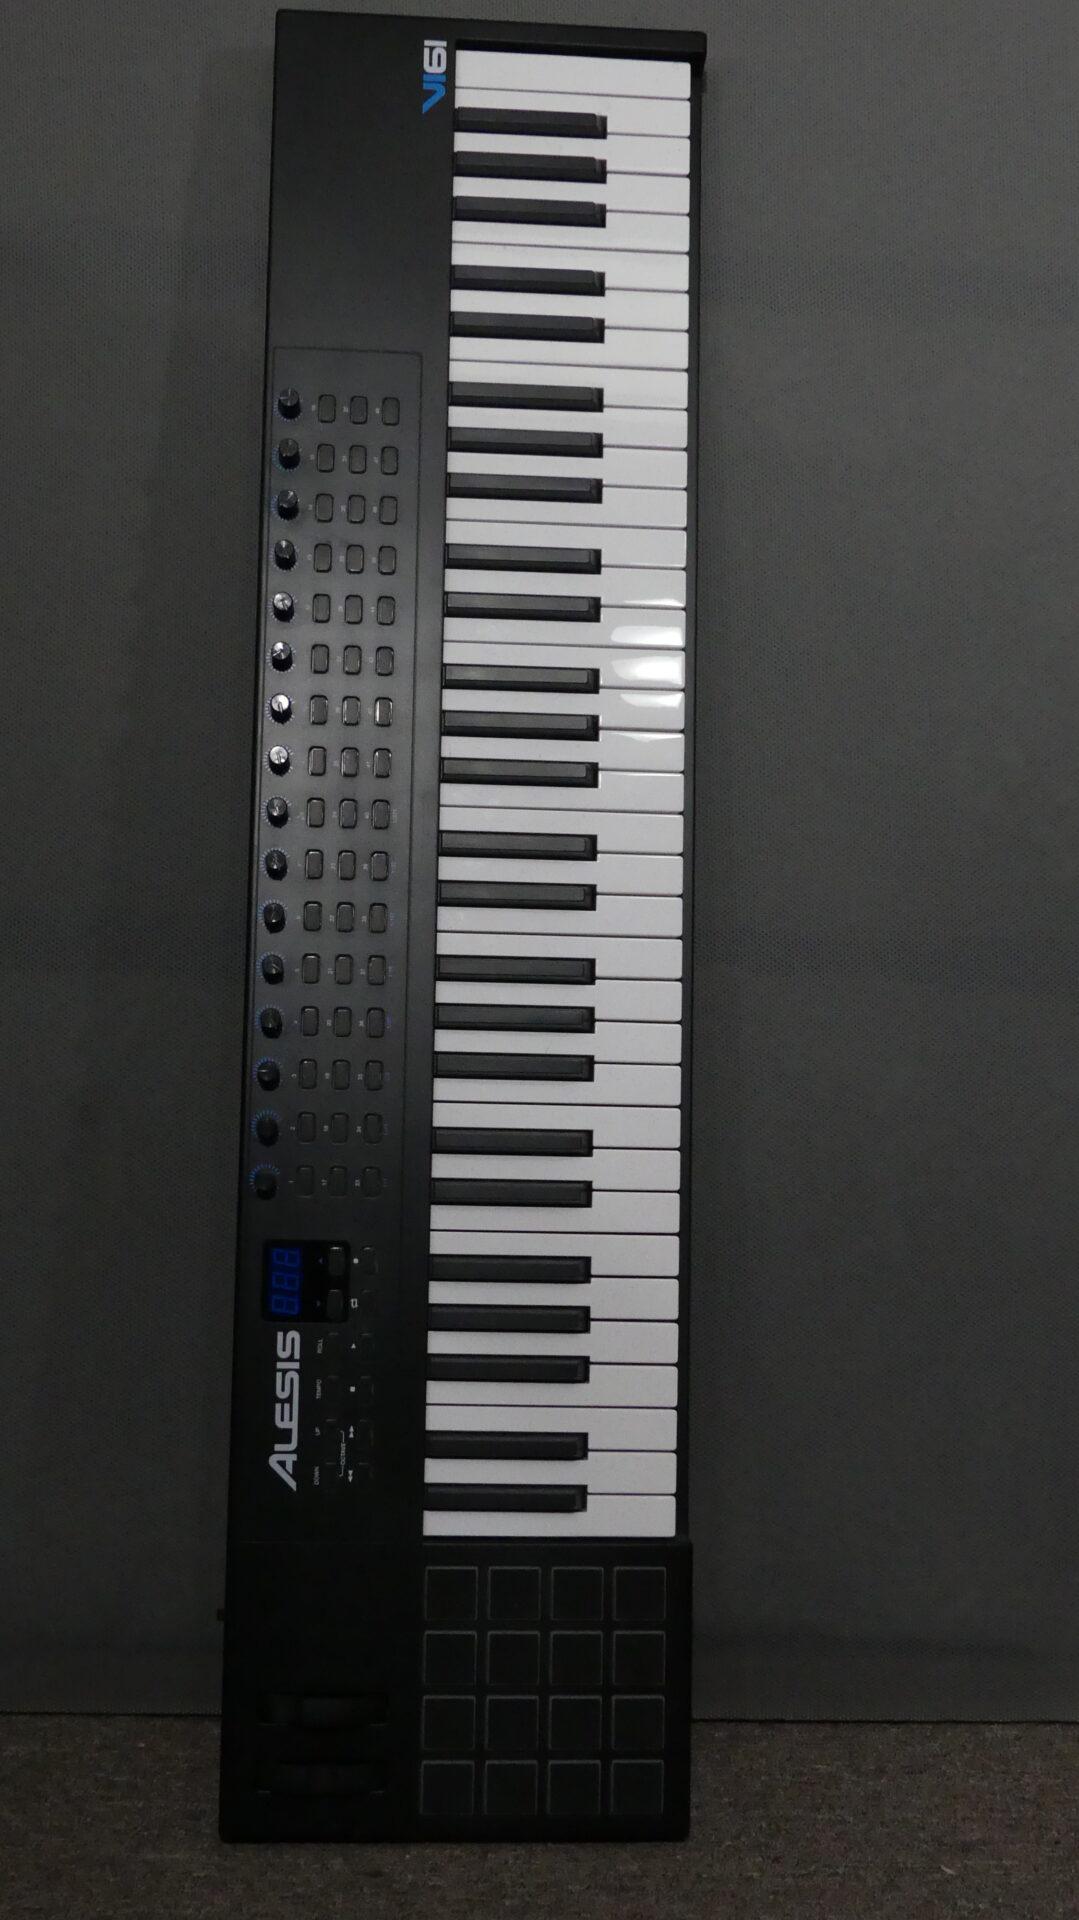 P1060677